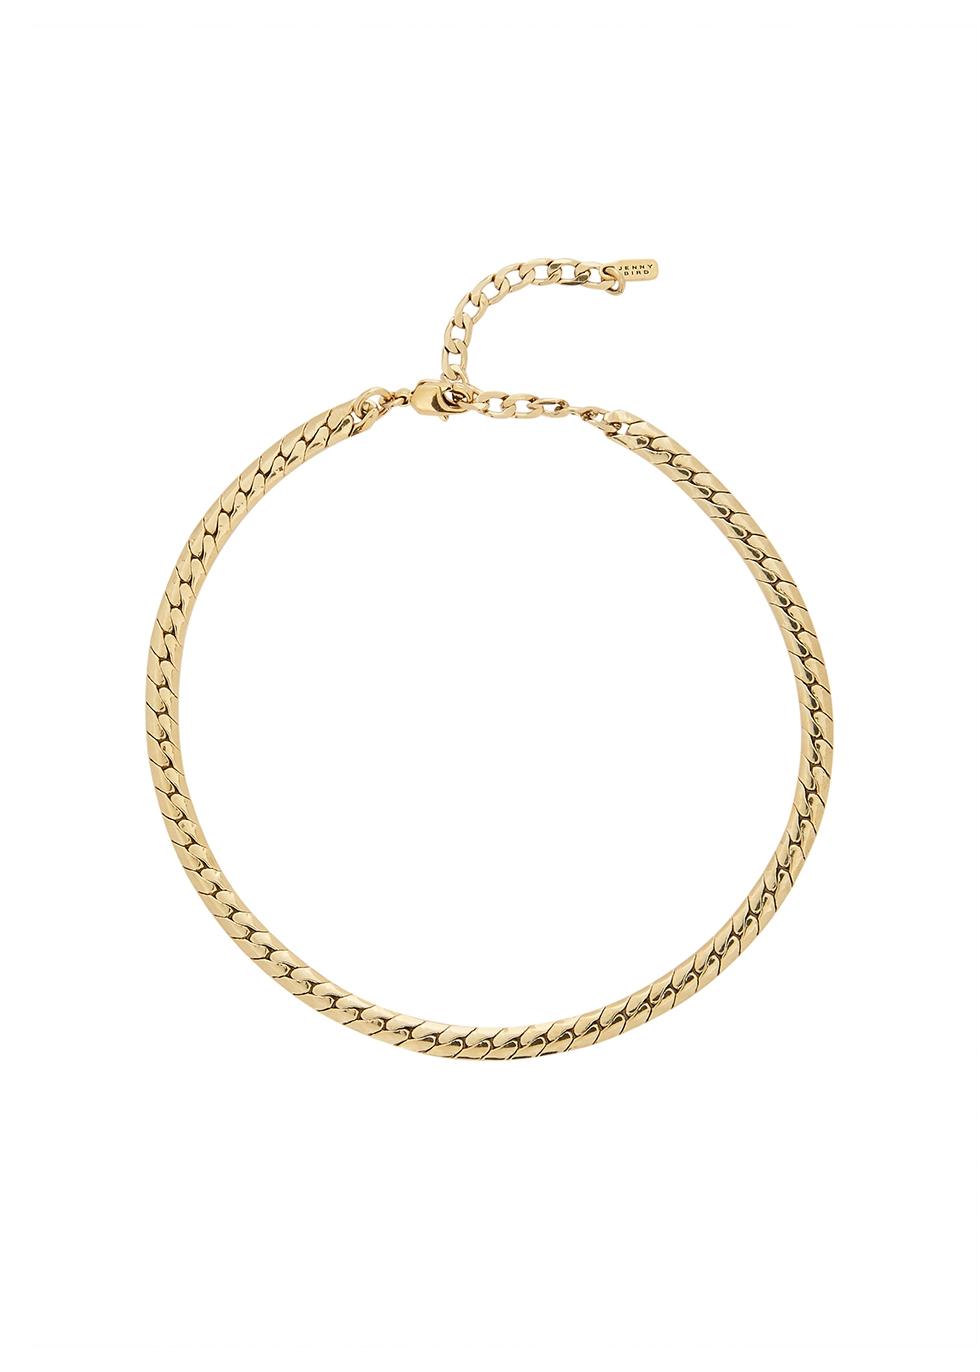 Priya 14kt gold-dipped chain anklet